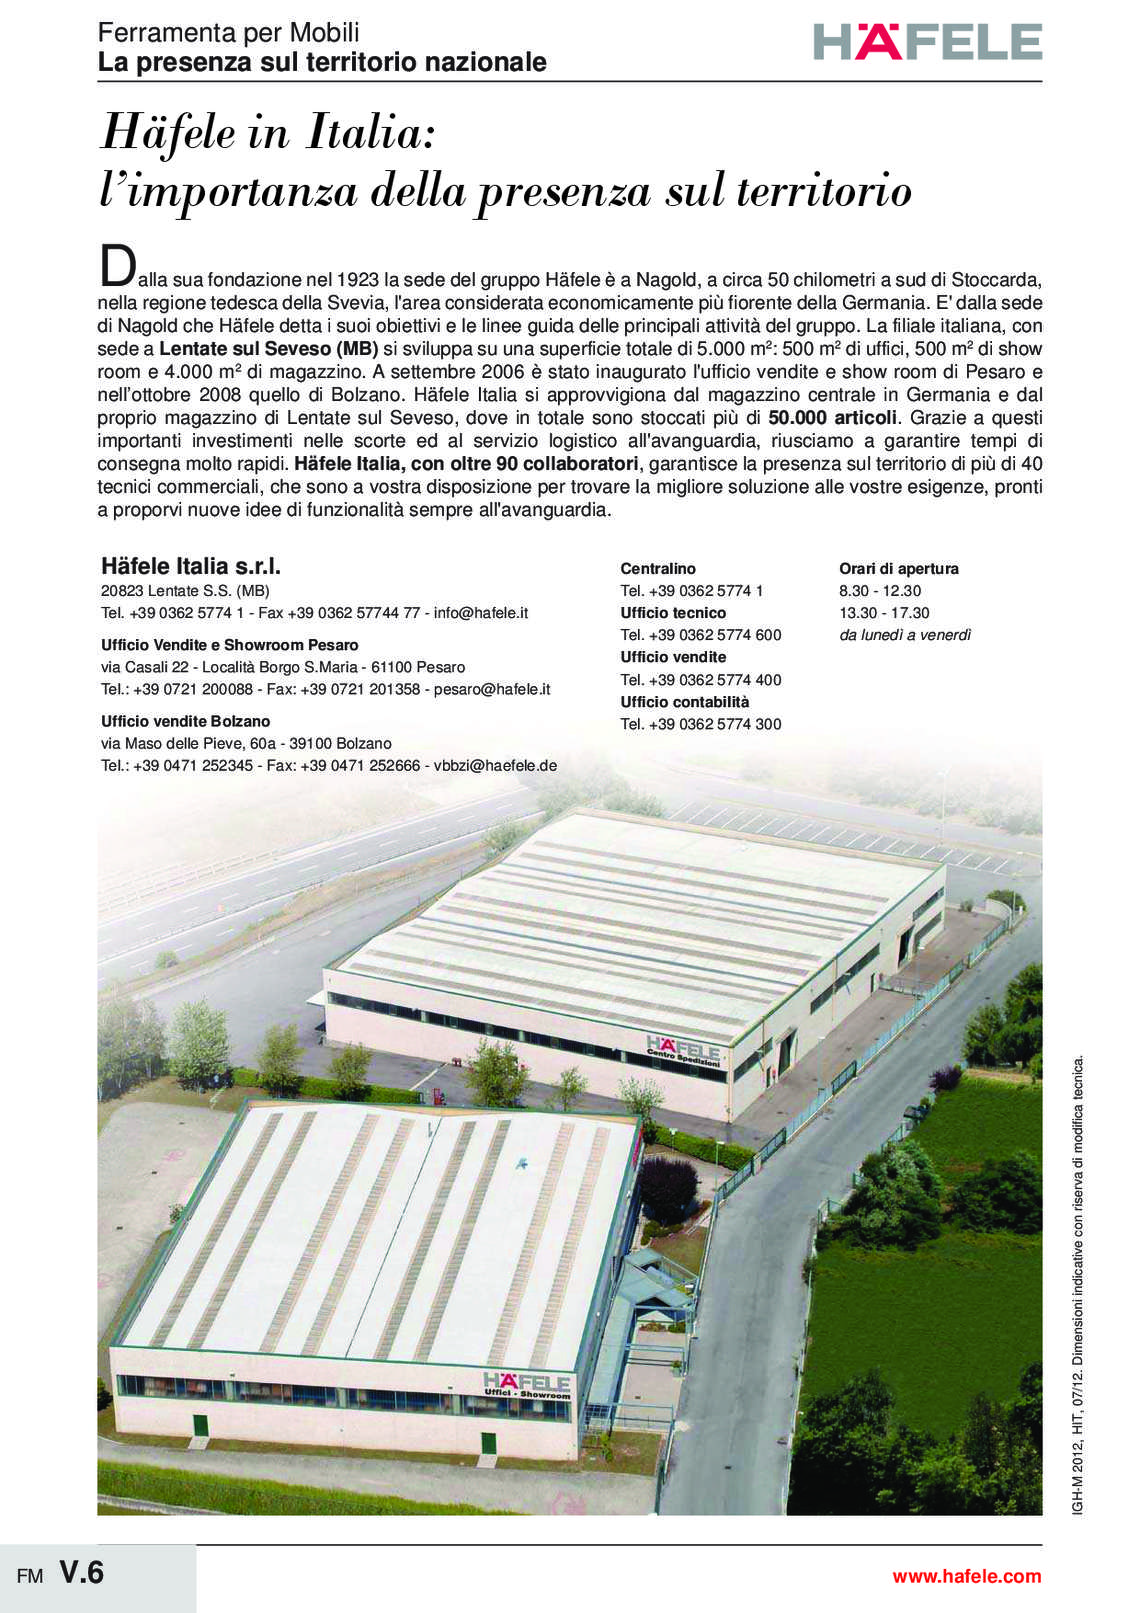 hafele-arredo-negozi-e-farmacie_32_007.jpg